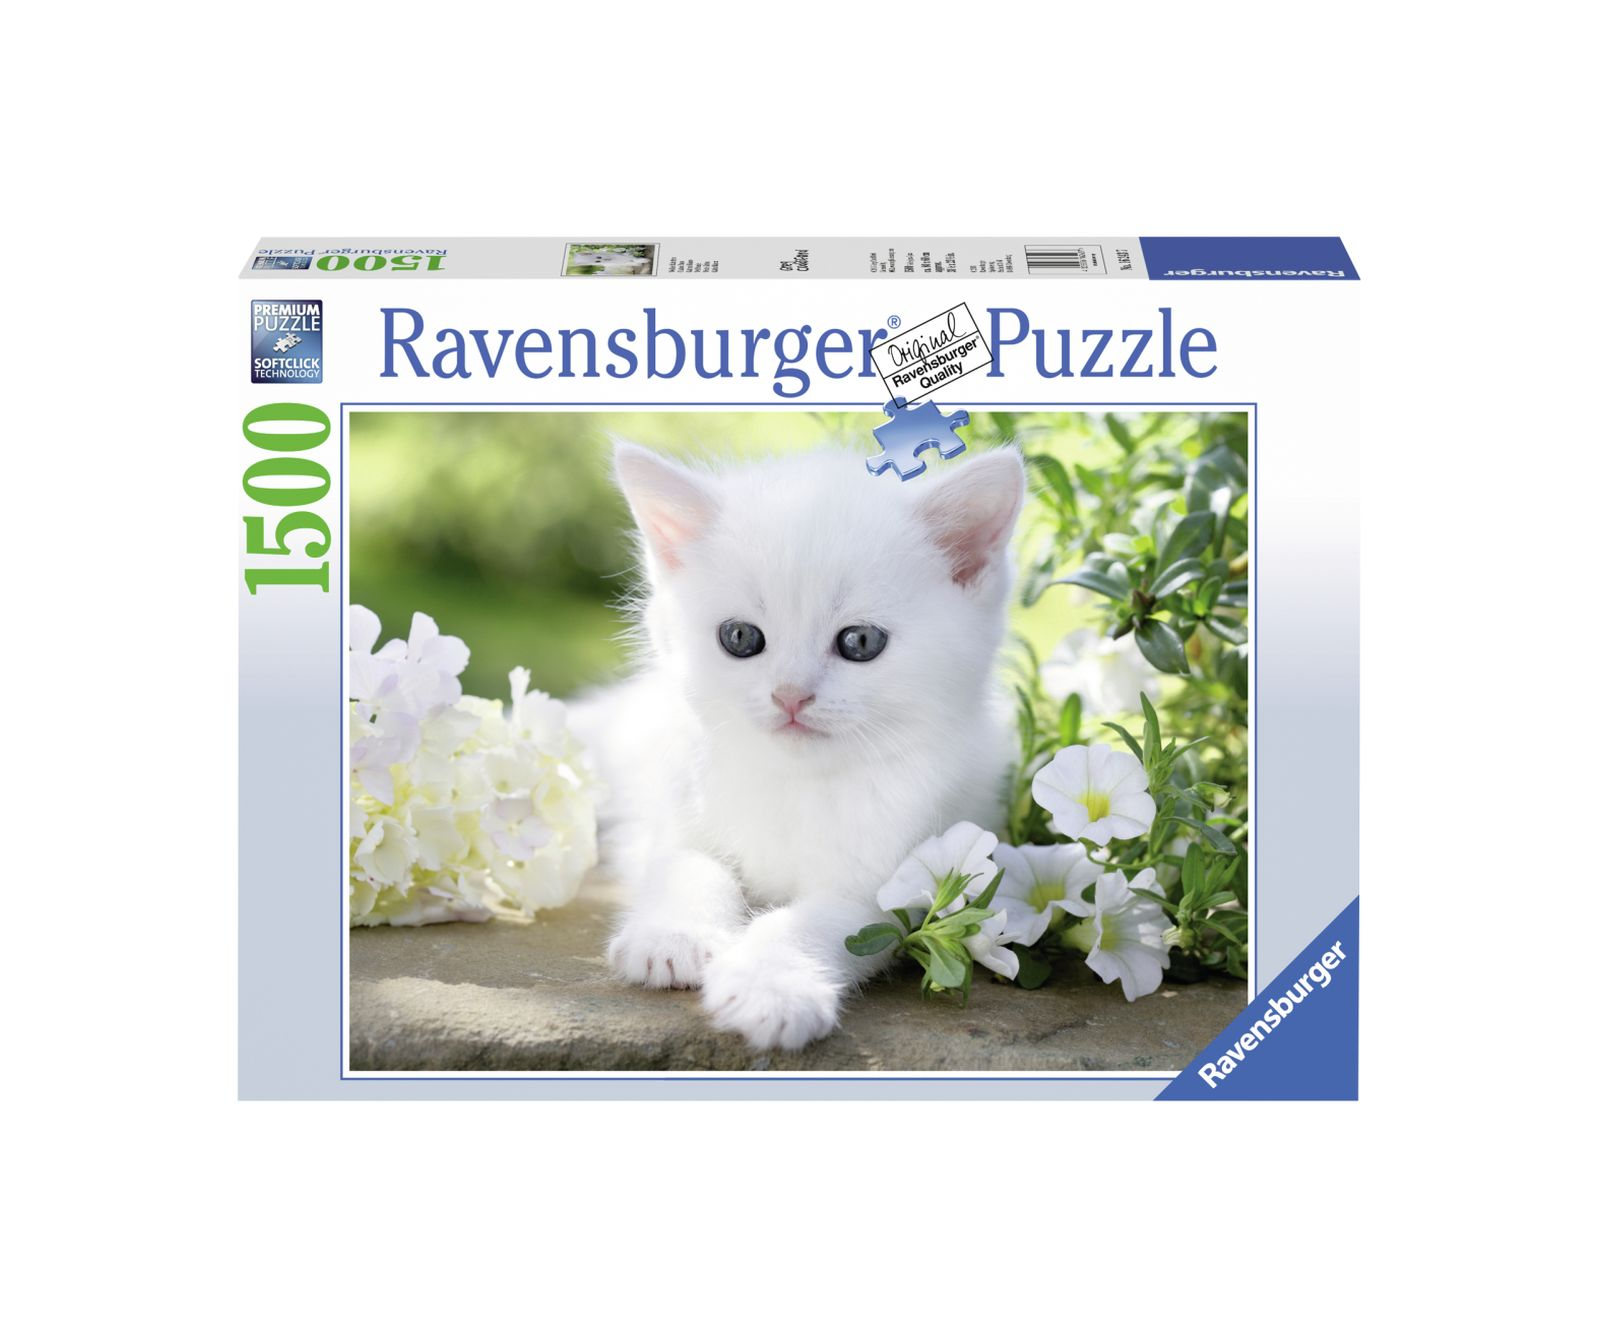 Ravensburger puzzle 1500 pezzi gattino bianco - Ravensburger1